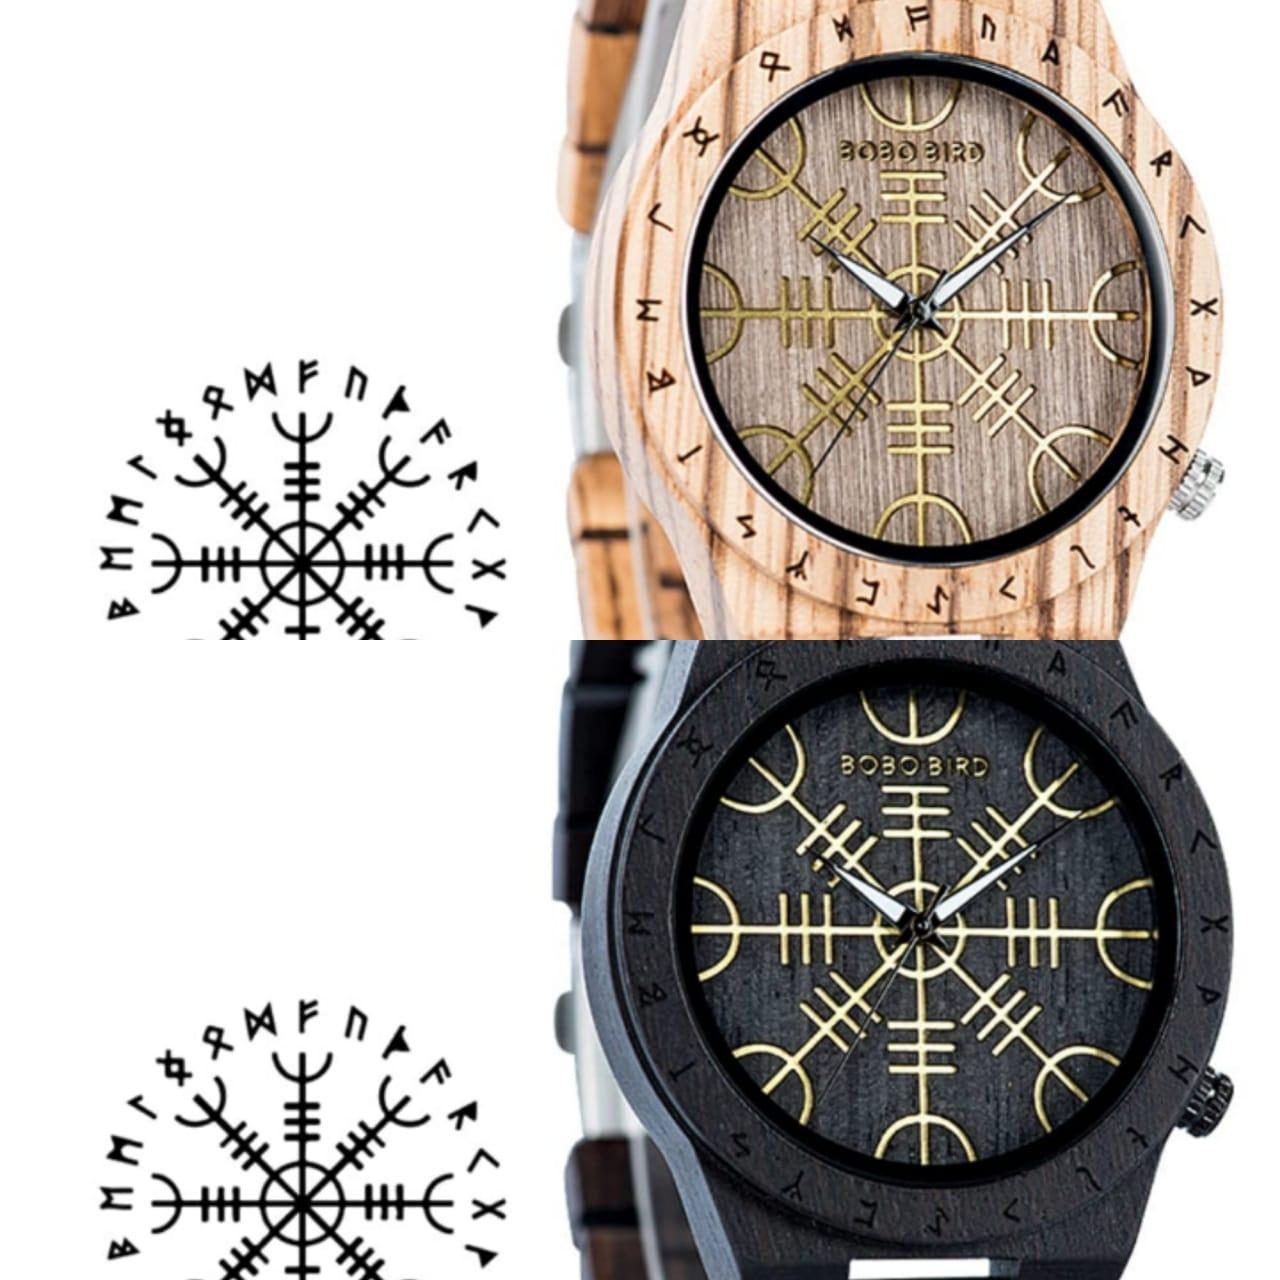 Relógio de Madeira Stenocalyx - Bobo Bird